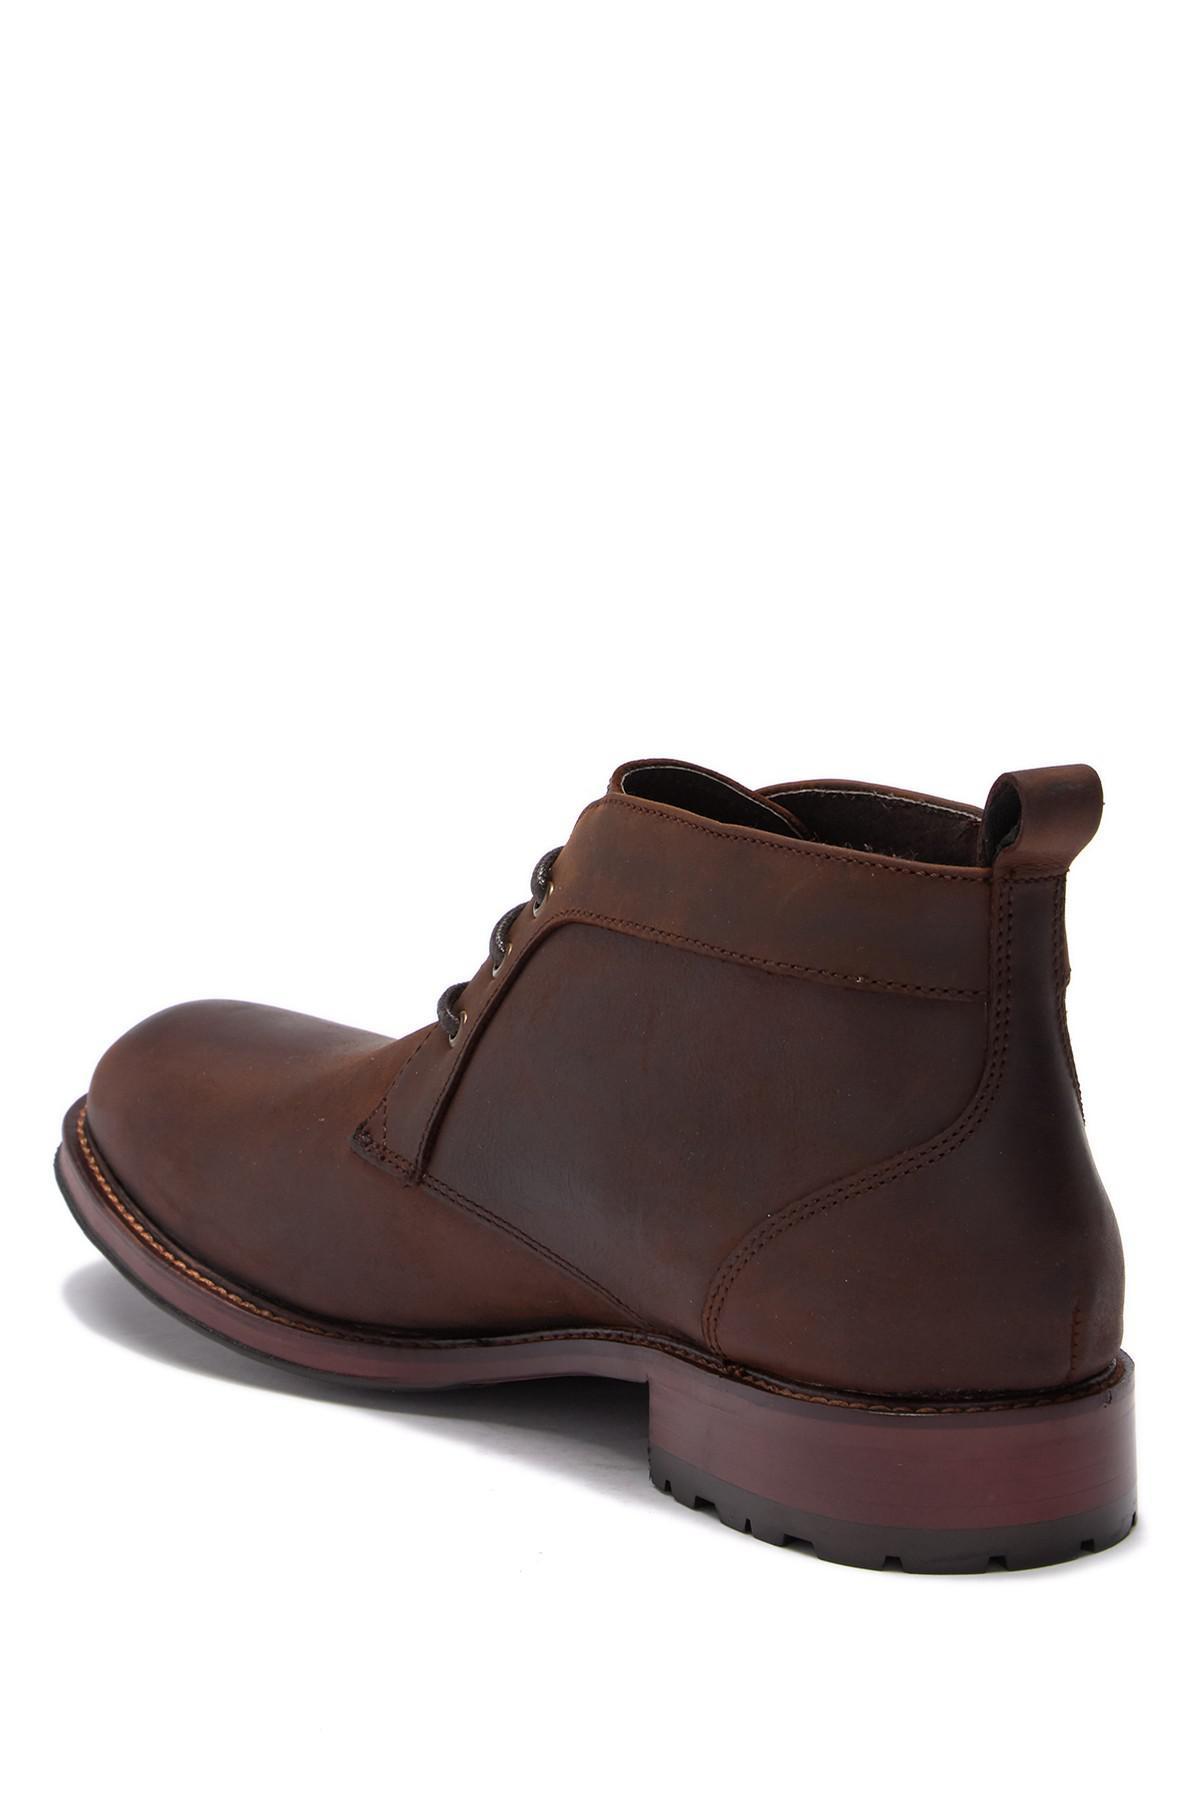 95f2055bb7b Lyst gordon rush cavanagh leather chukka boot in brown for men jpg  1200x1800 Gordon rush chukka